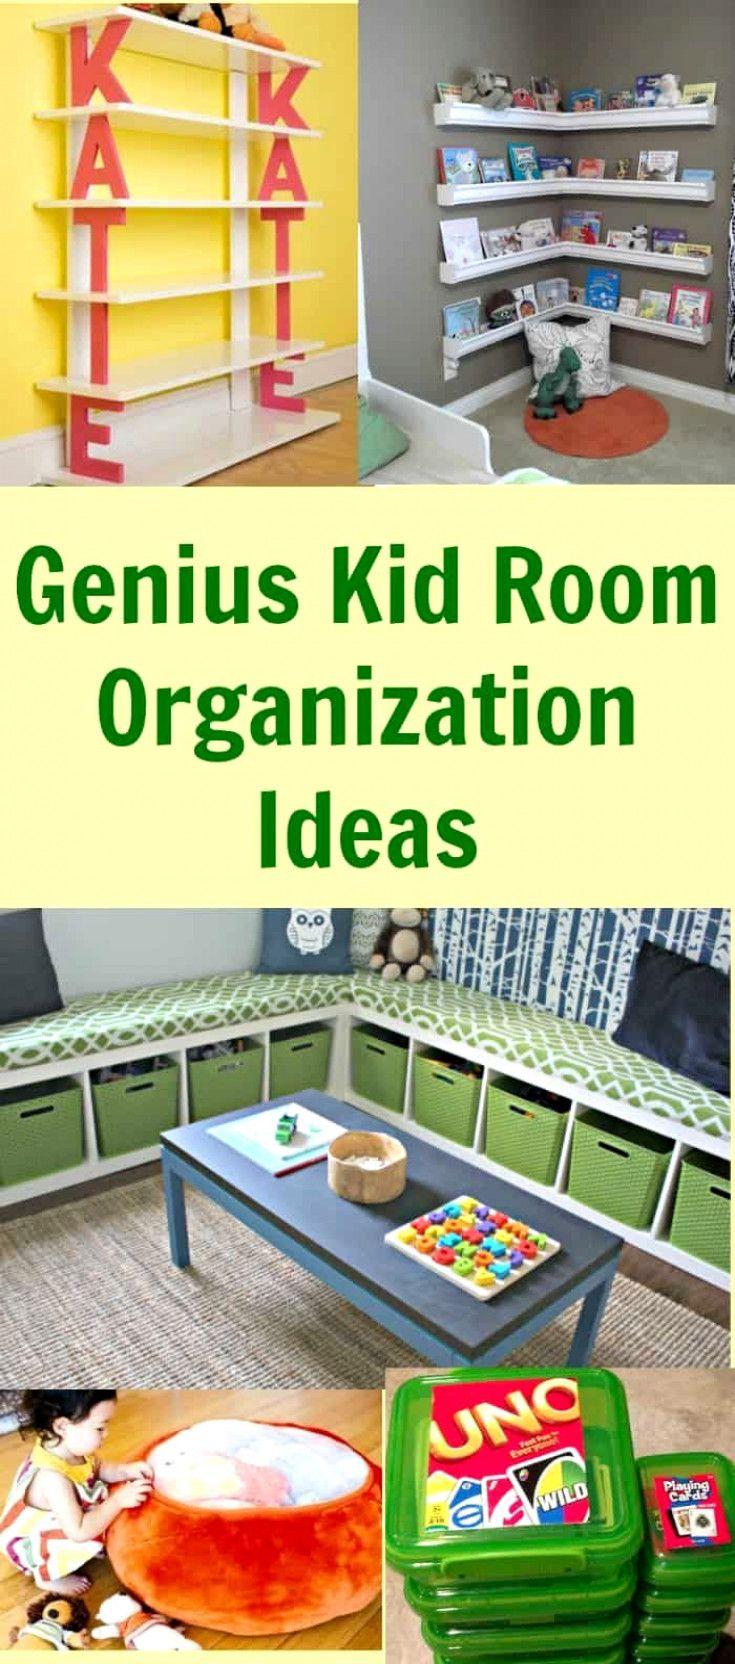 Genius Kid Room Organization Ideas images